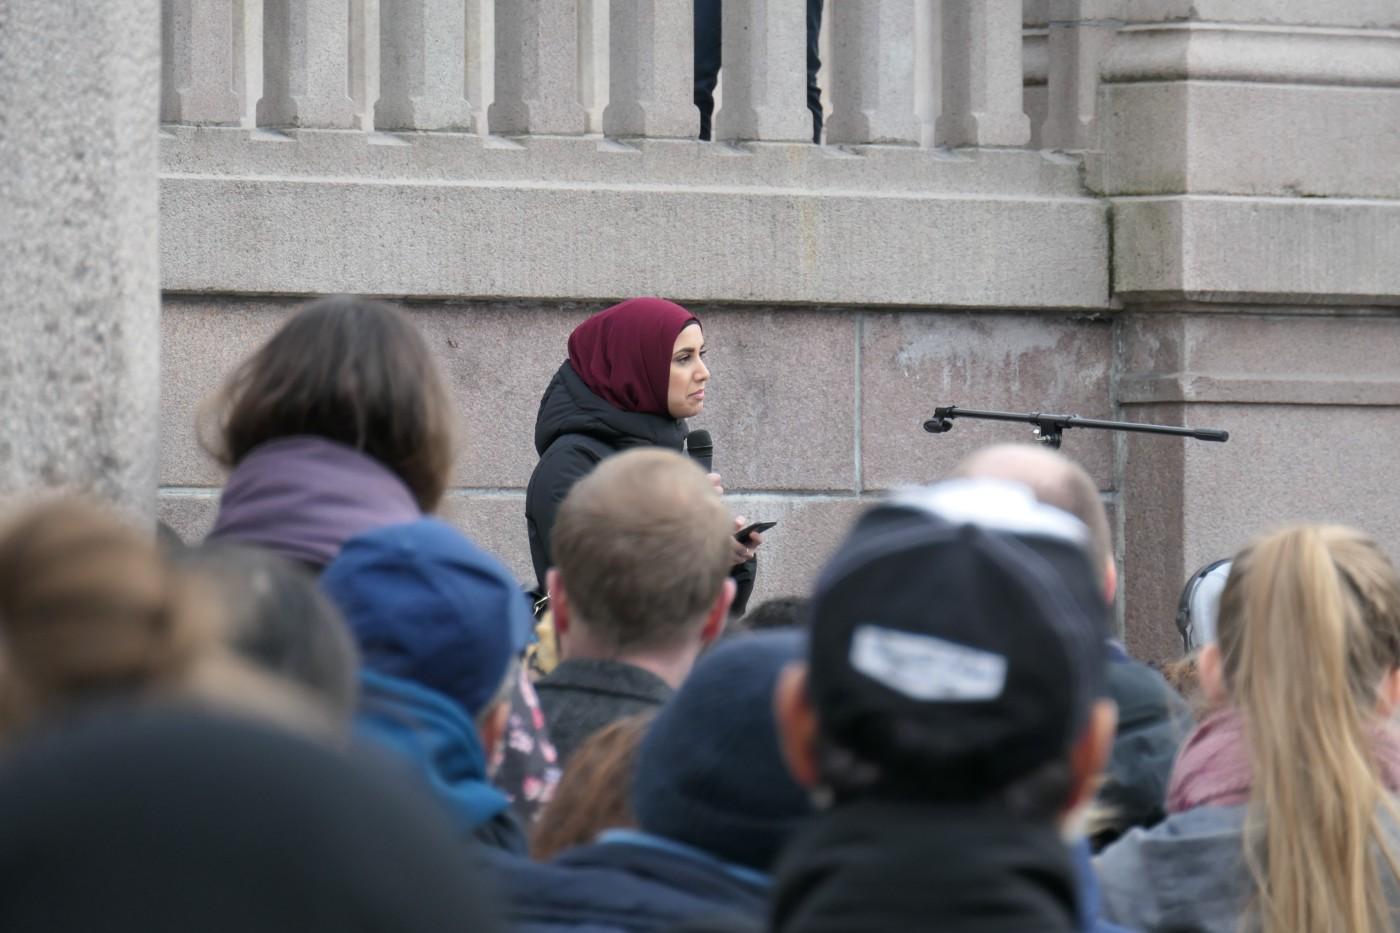 Faten Mahdi Al – Hussaini – Samfunnsdebattant utenfor stortinget